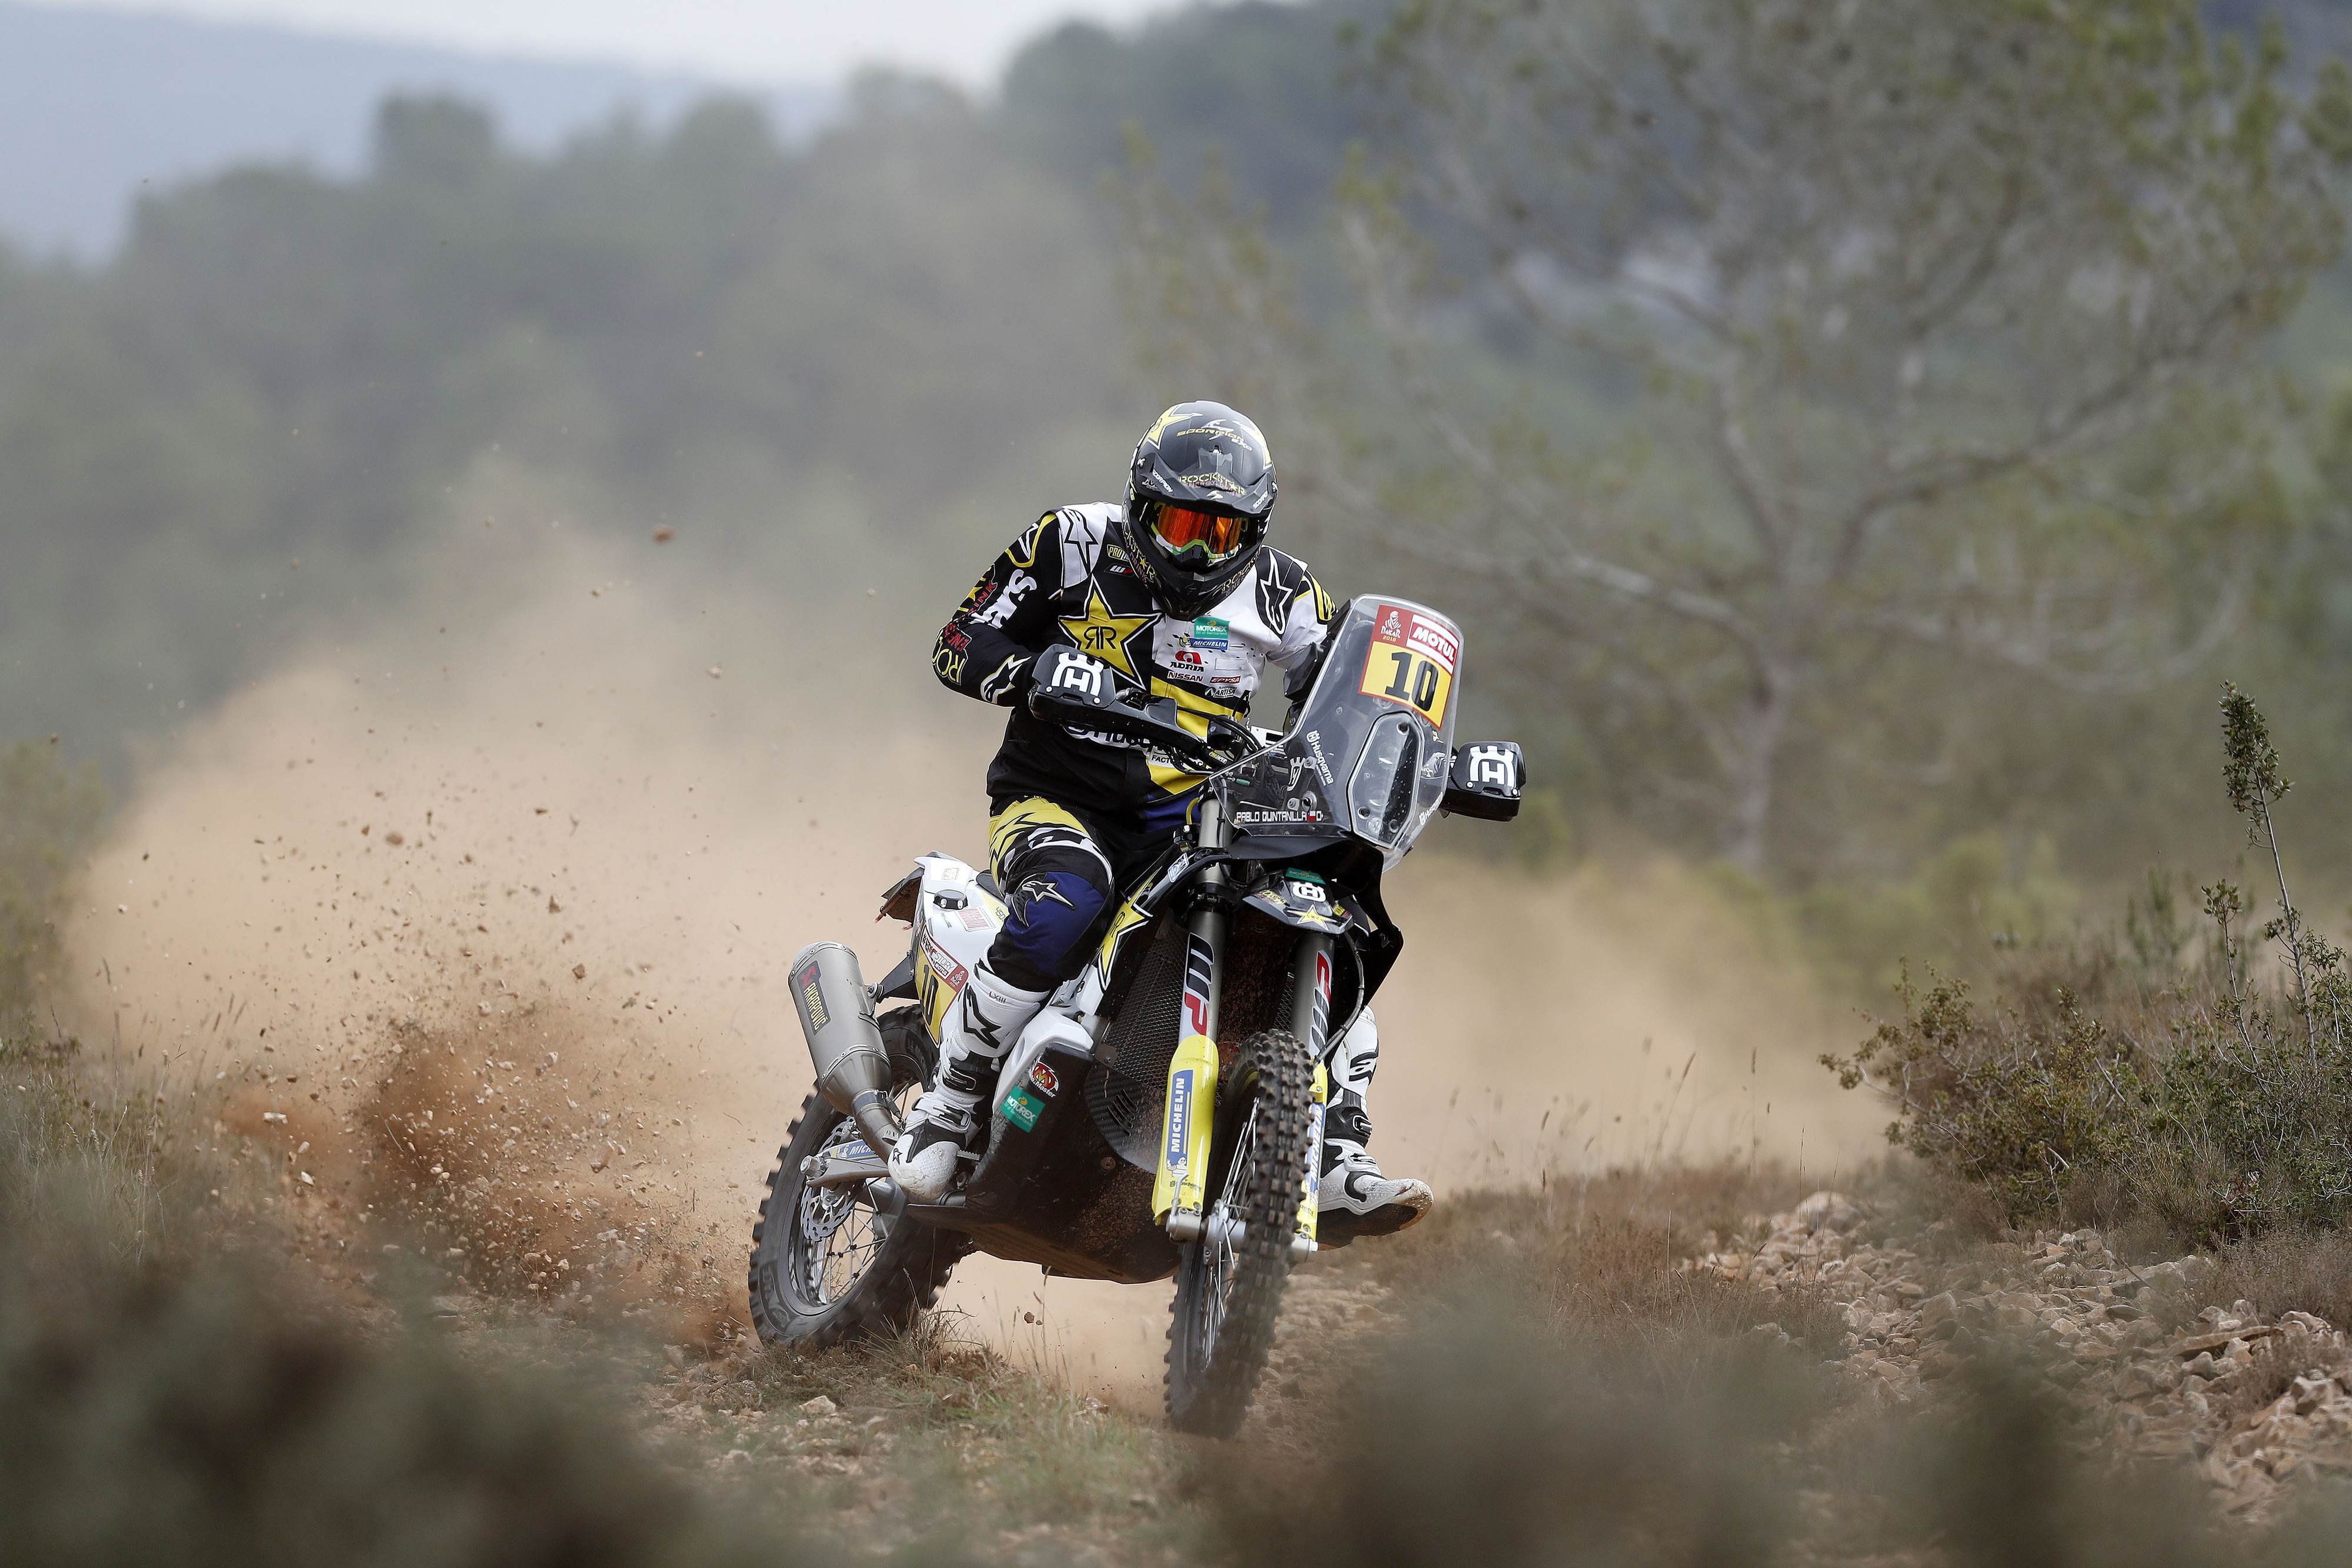 Pablo Quintanilla - Action - Rockstar Energy Husqvarna Factory Racing